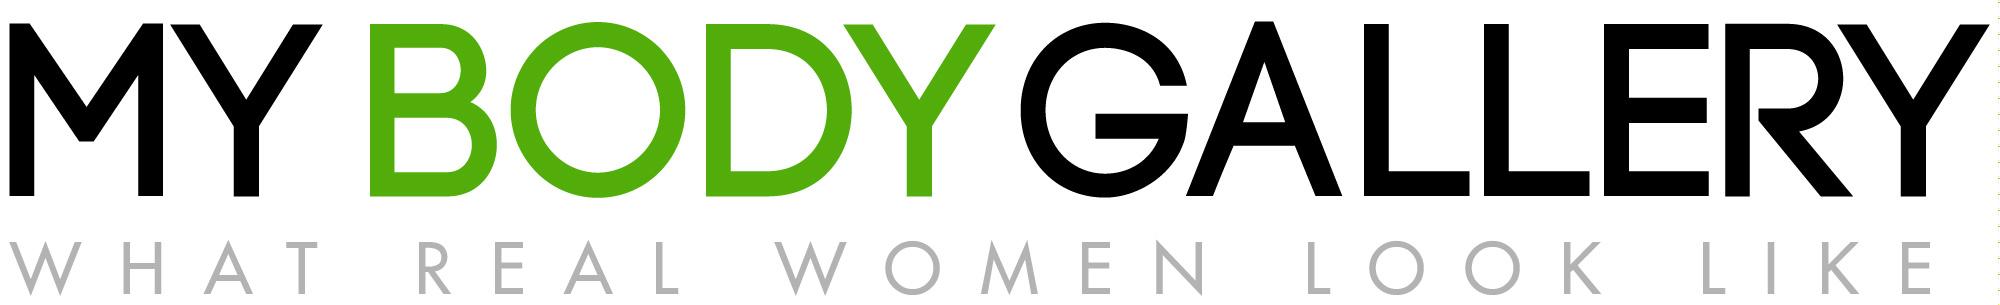 MyBodyGallery Logo